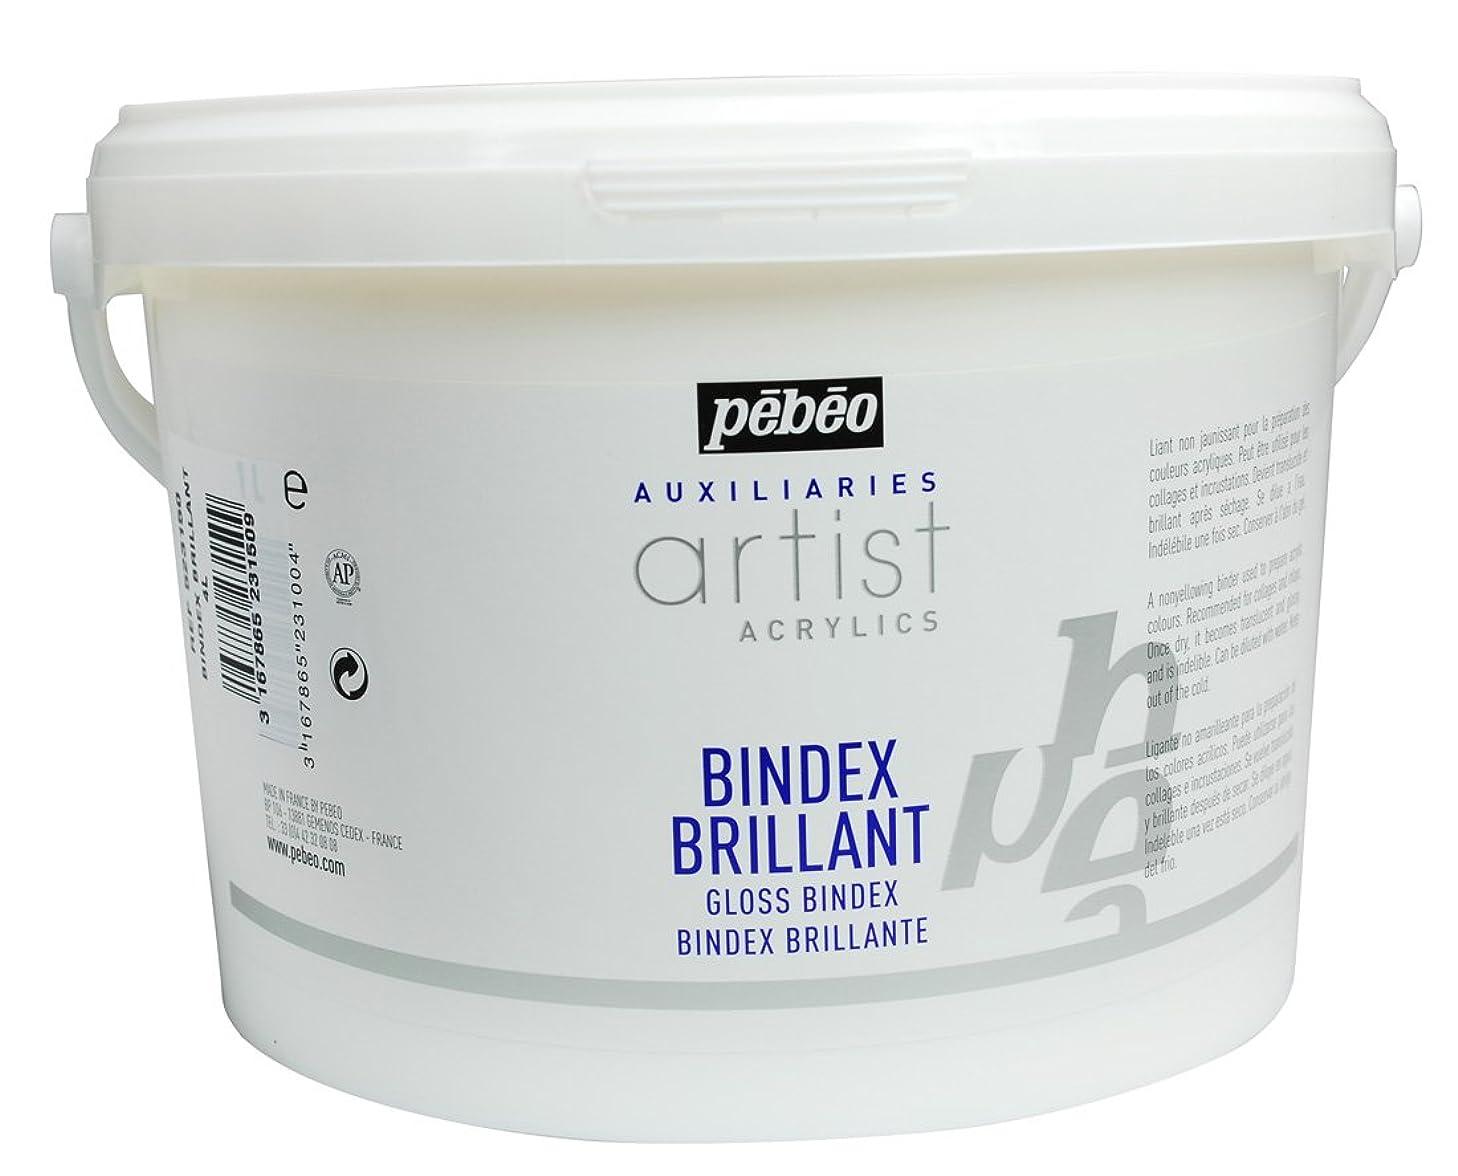 PEBEO 523150 4 Litre Gloss Bindex, Transparent